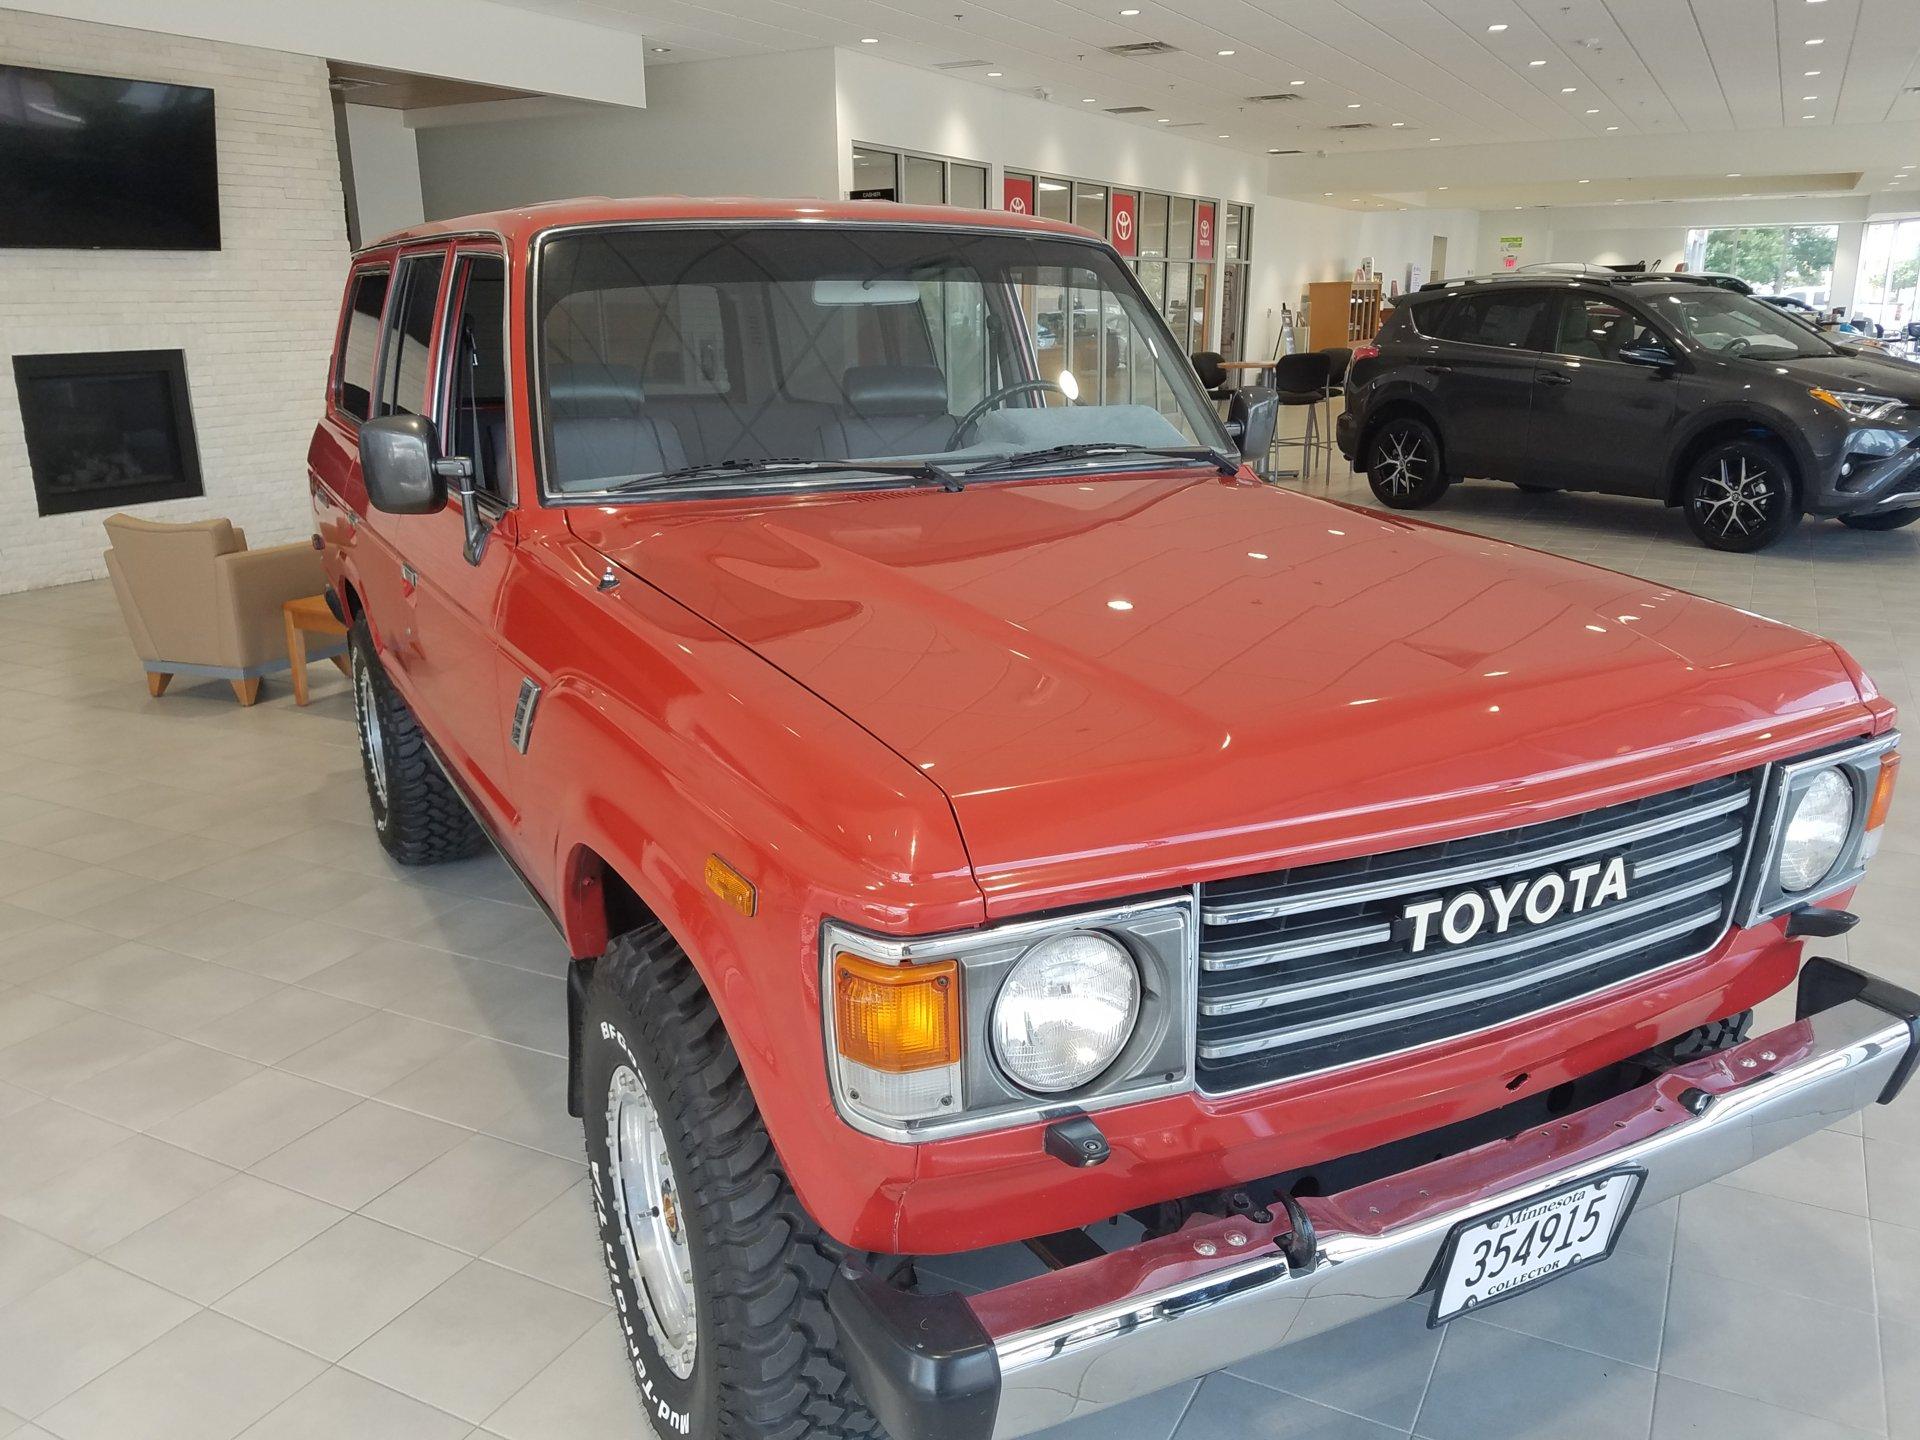 For Sale 1986 Toyota Land Cruiser 4 spd